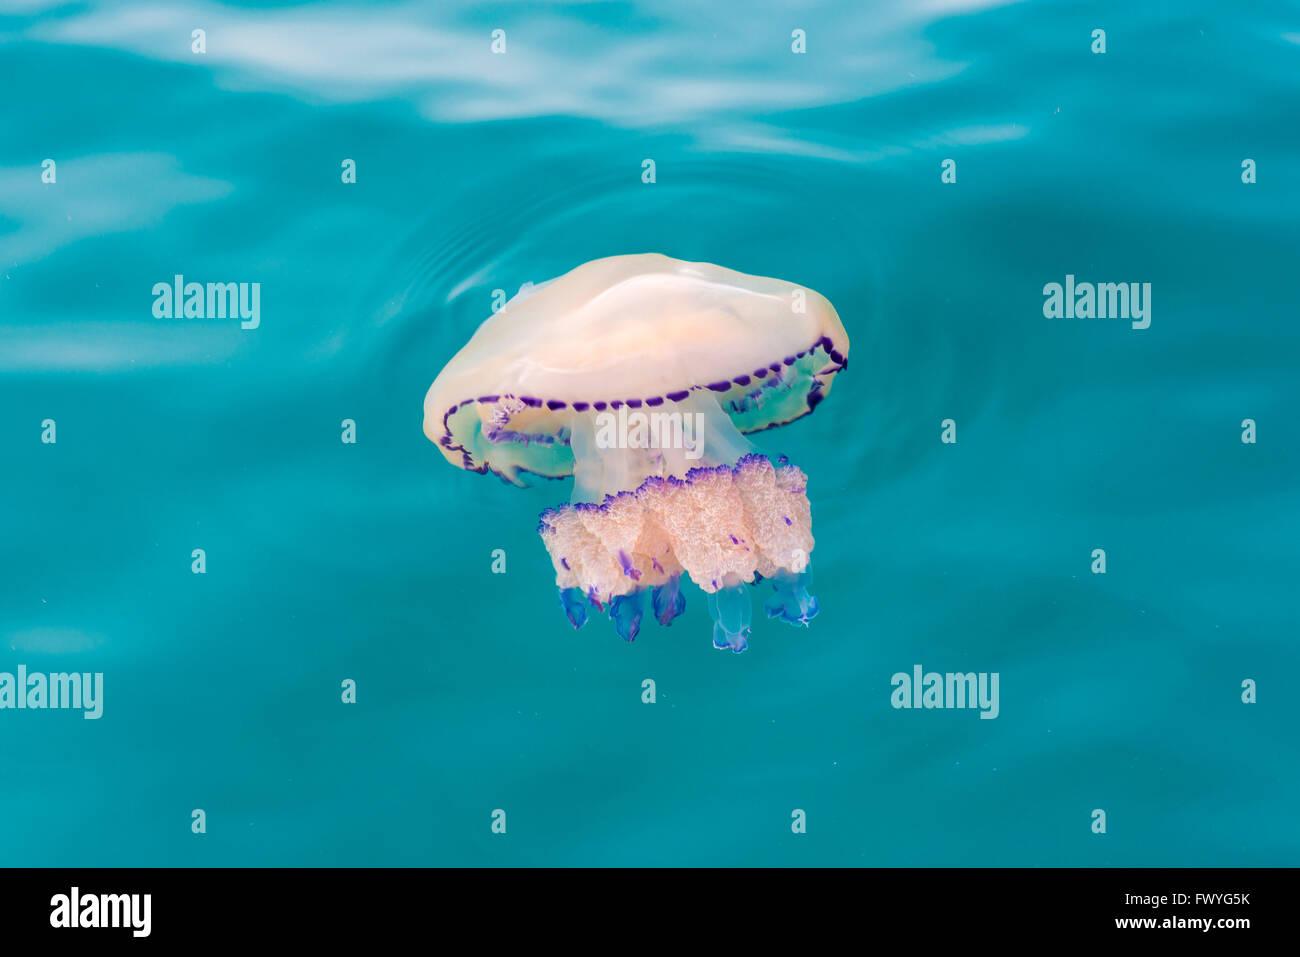 Barrel jellyfish (Rhizostoma octopus), Adriatic Sea, Friuli-Venezia Giulia, Italy Stock Photo